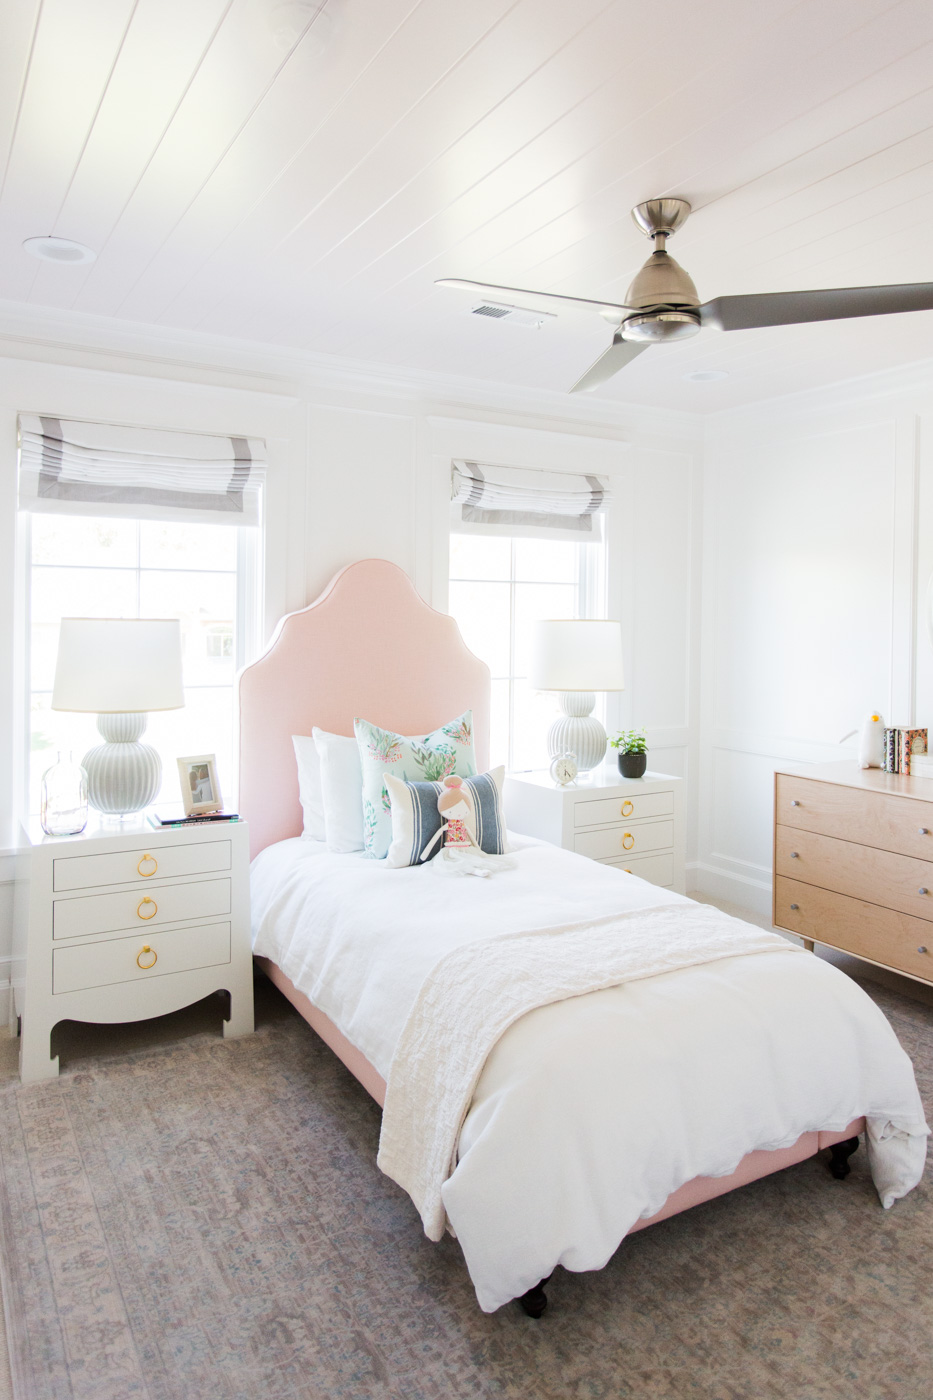 Sweet girls' room with pink headboard || Studio McGee